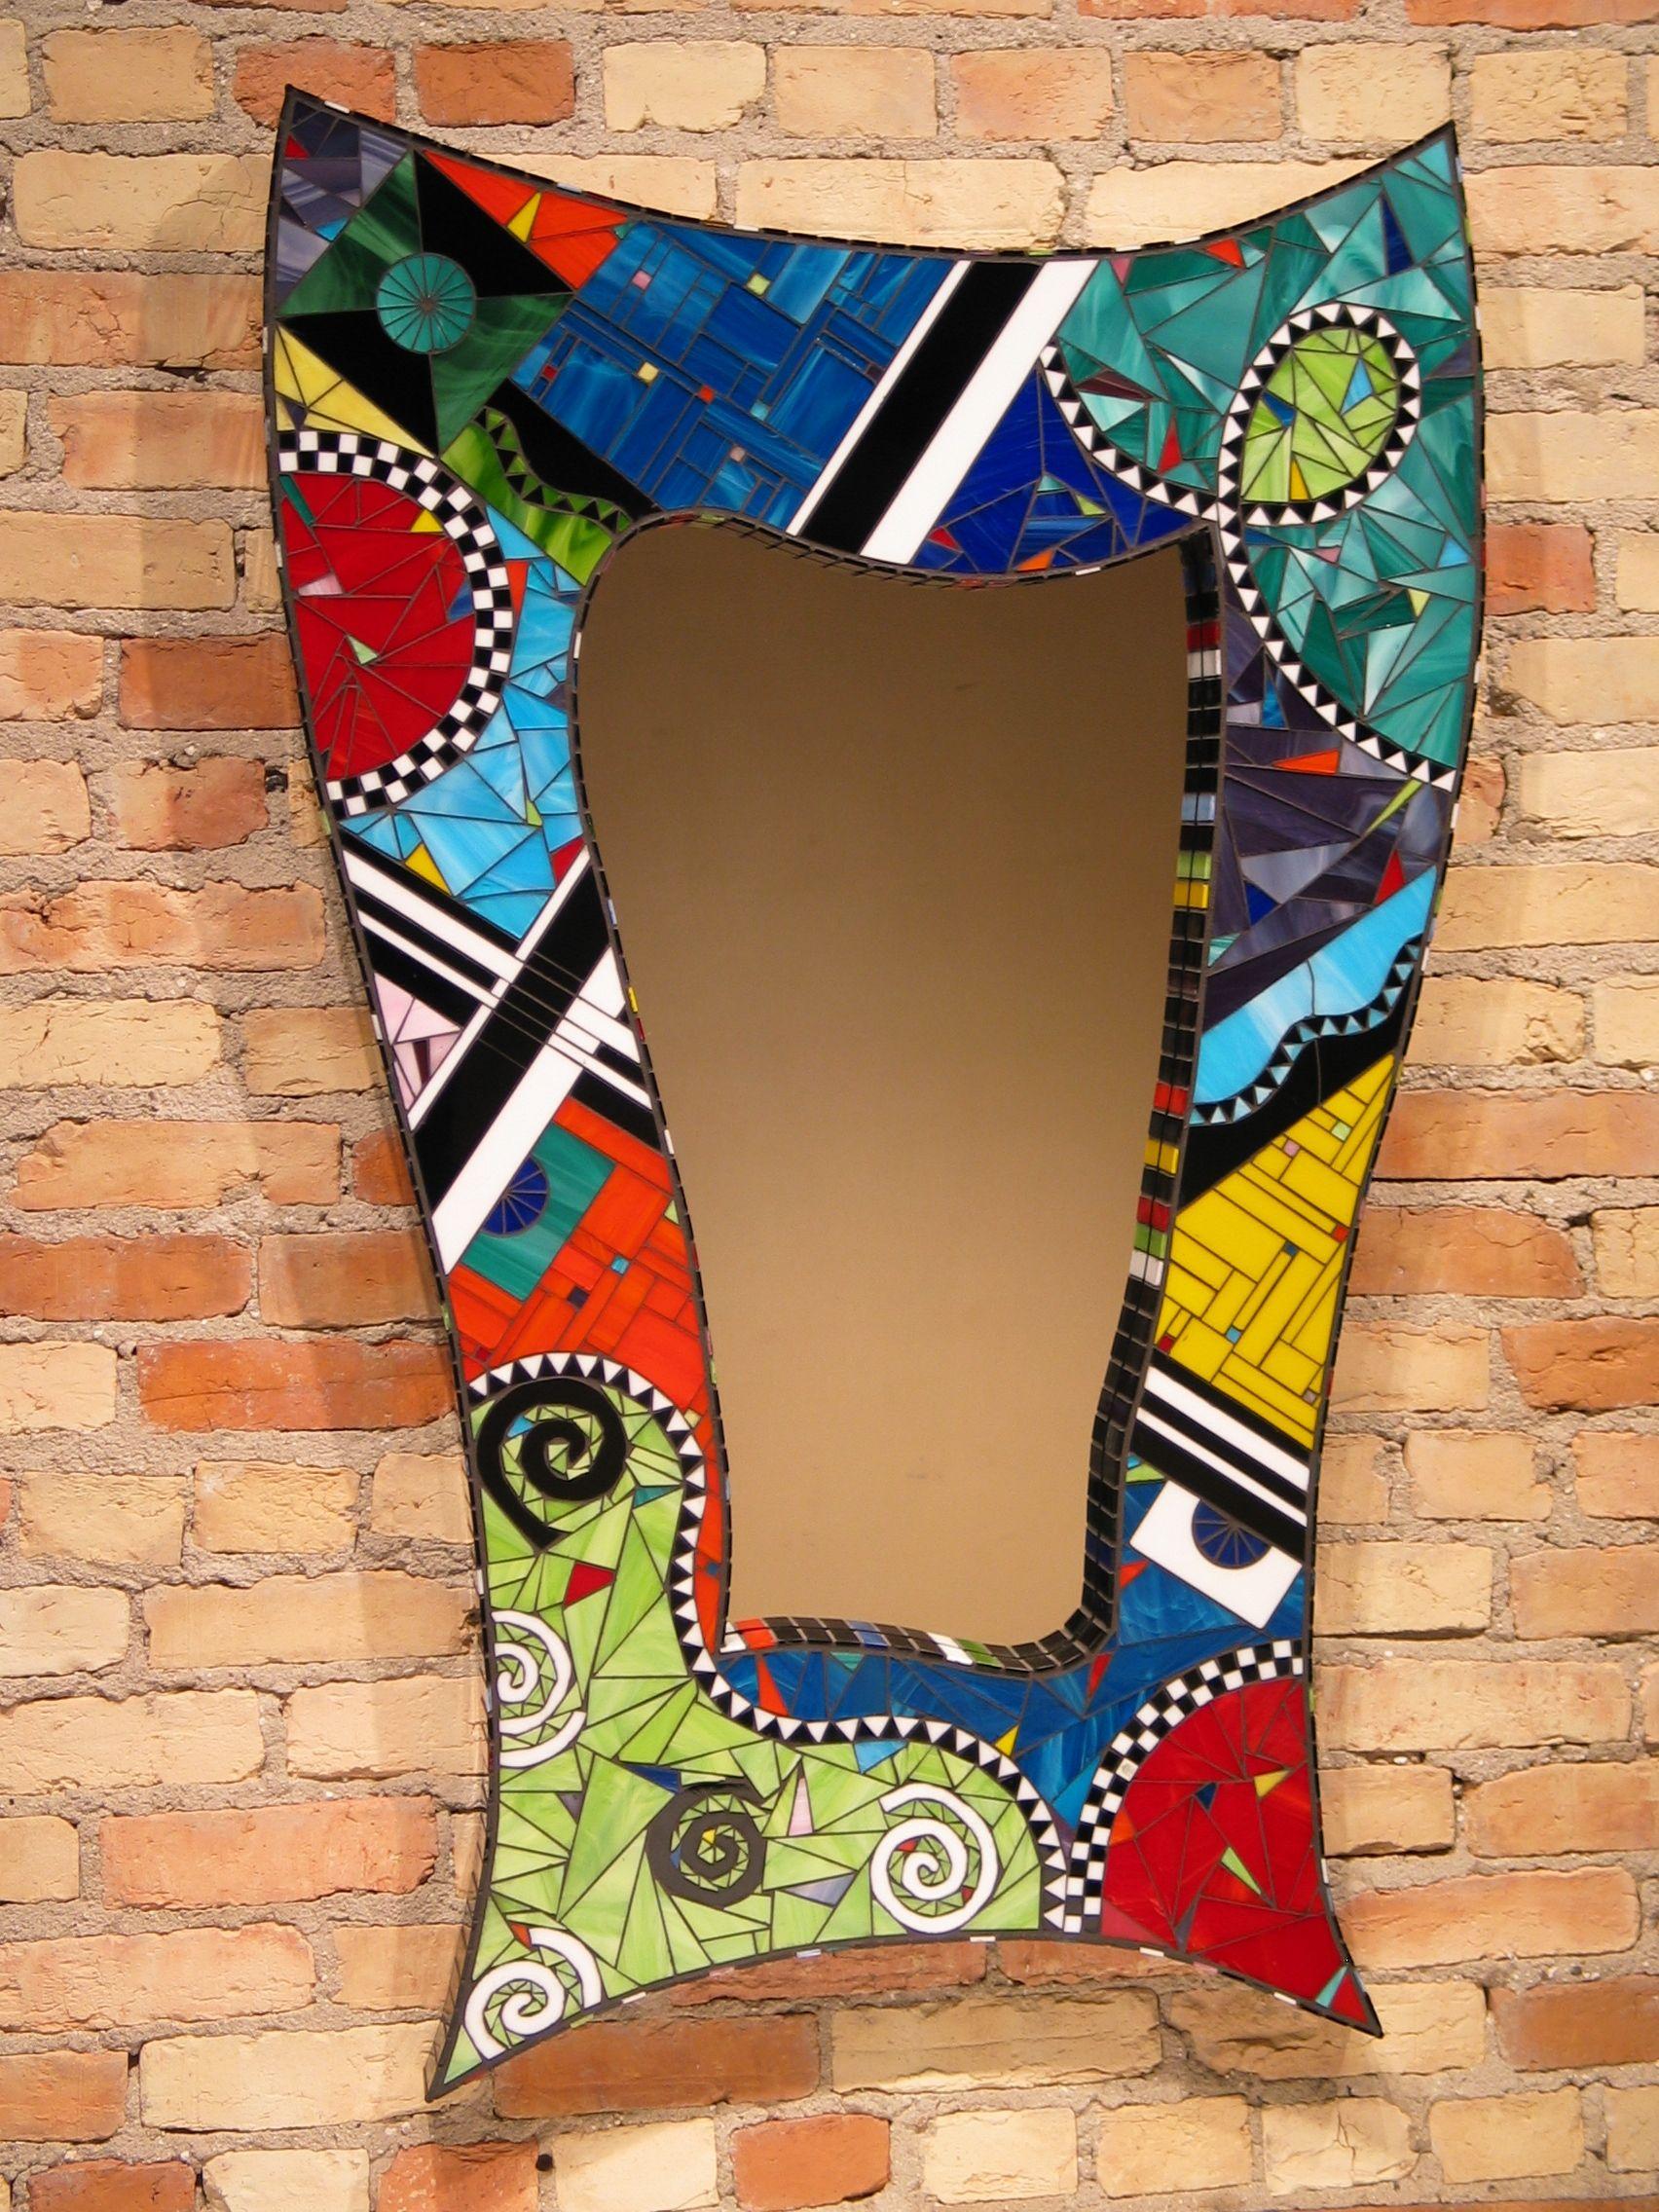 30 creative diy items with mosaic decor mosaic mirrors mosaics 30 creative diy items with mosaic decor solutioingenieria Images